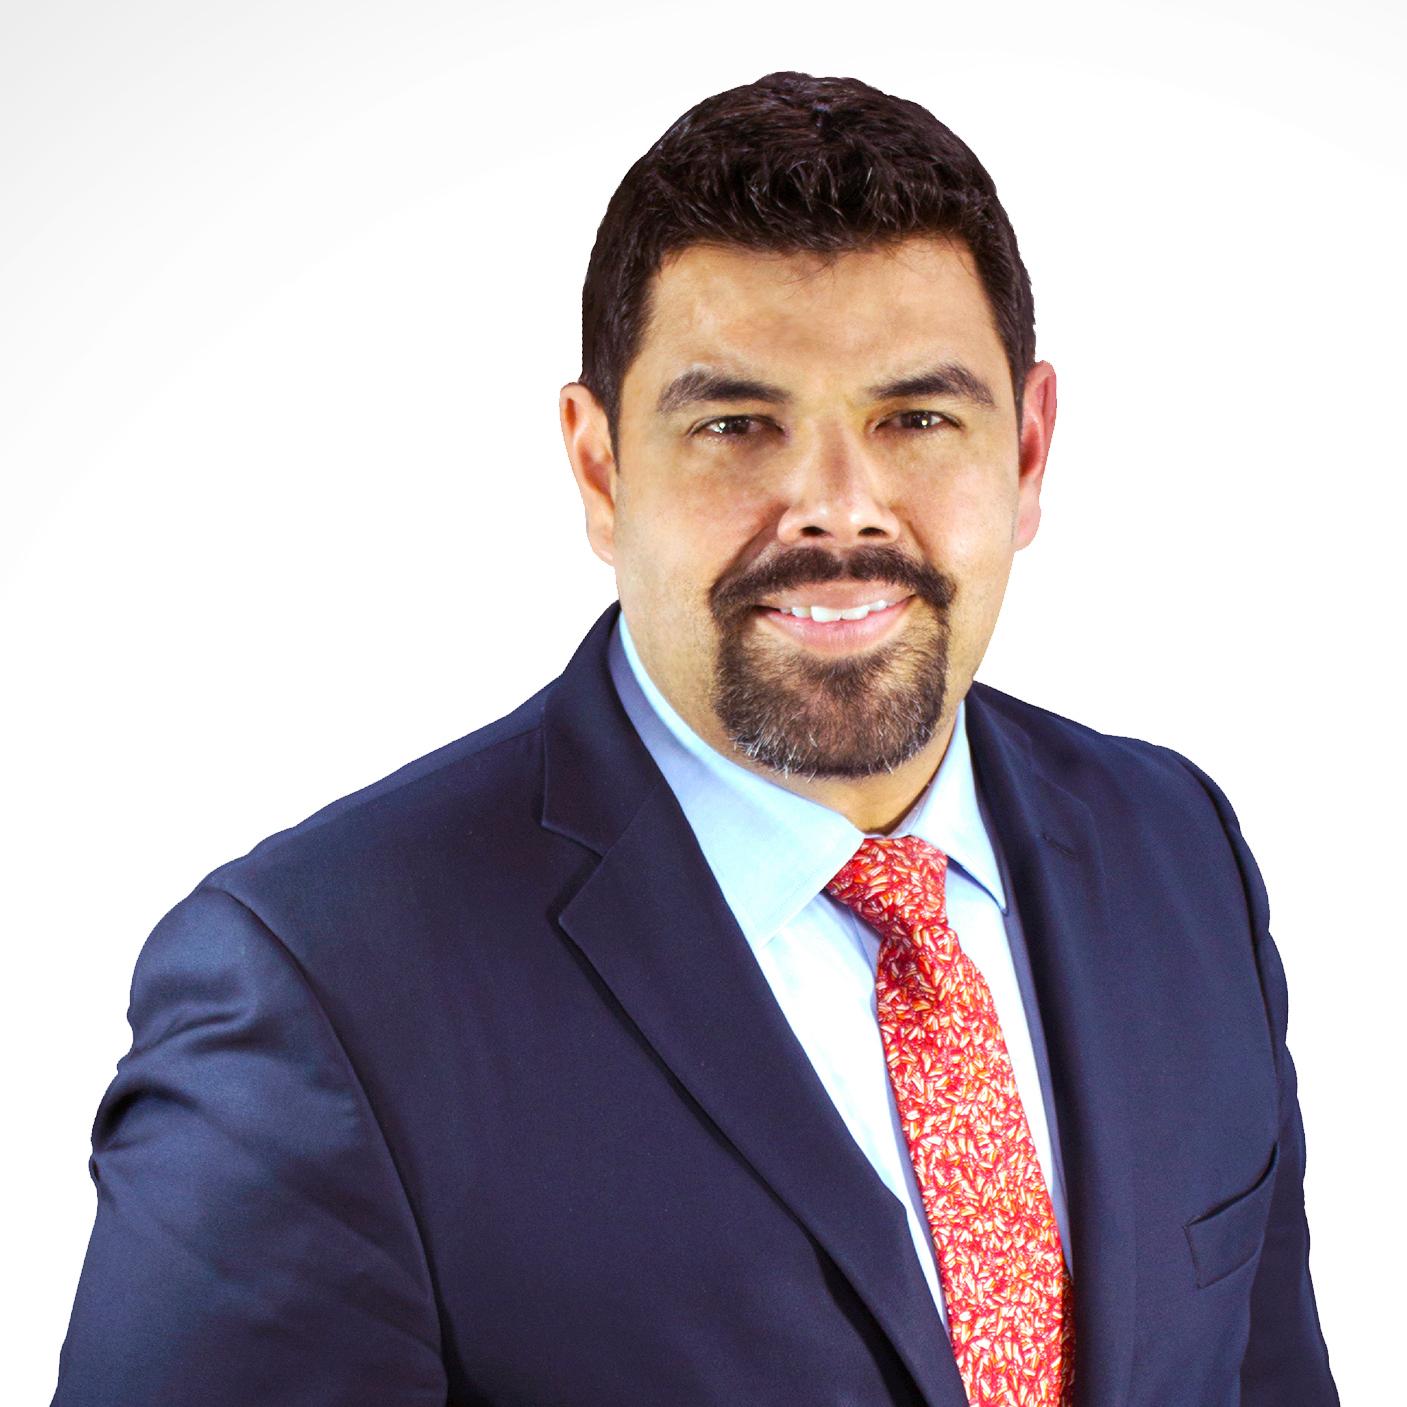 Carlos Trelles